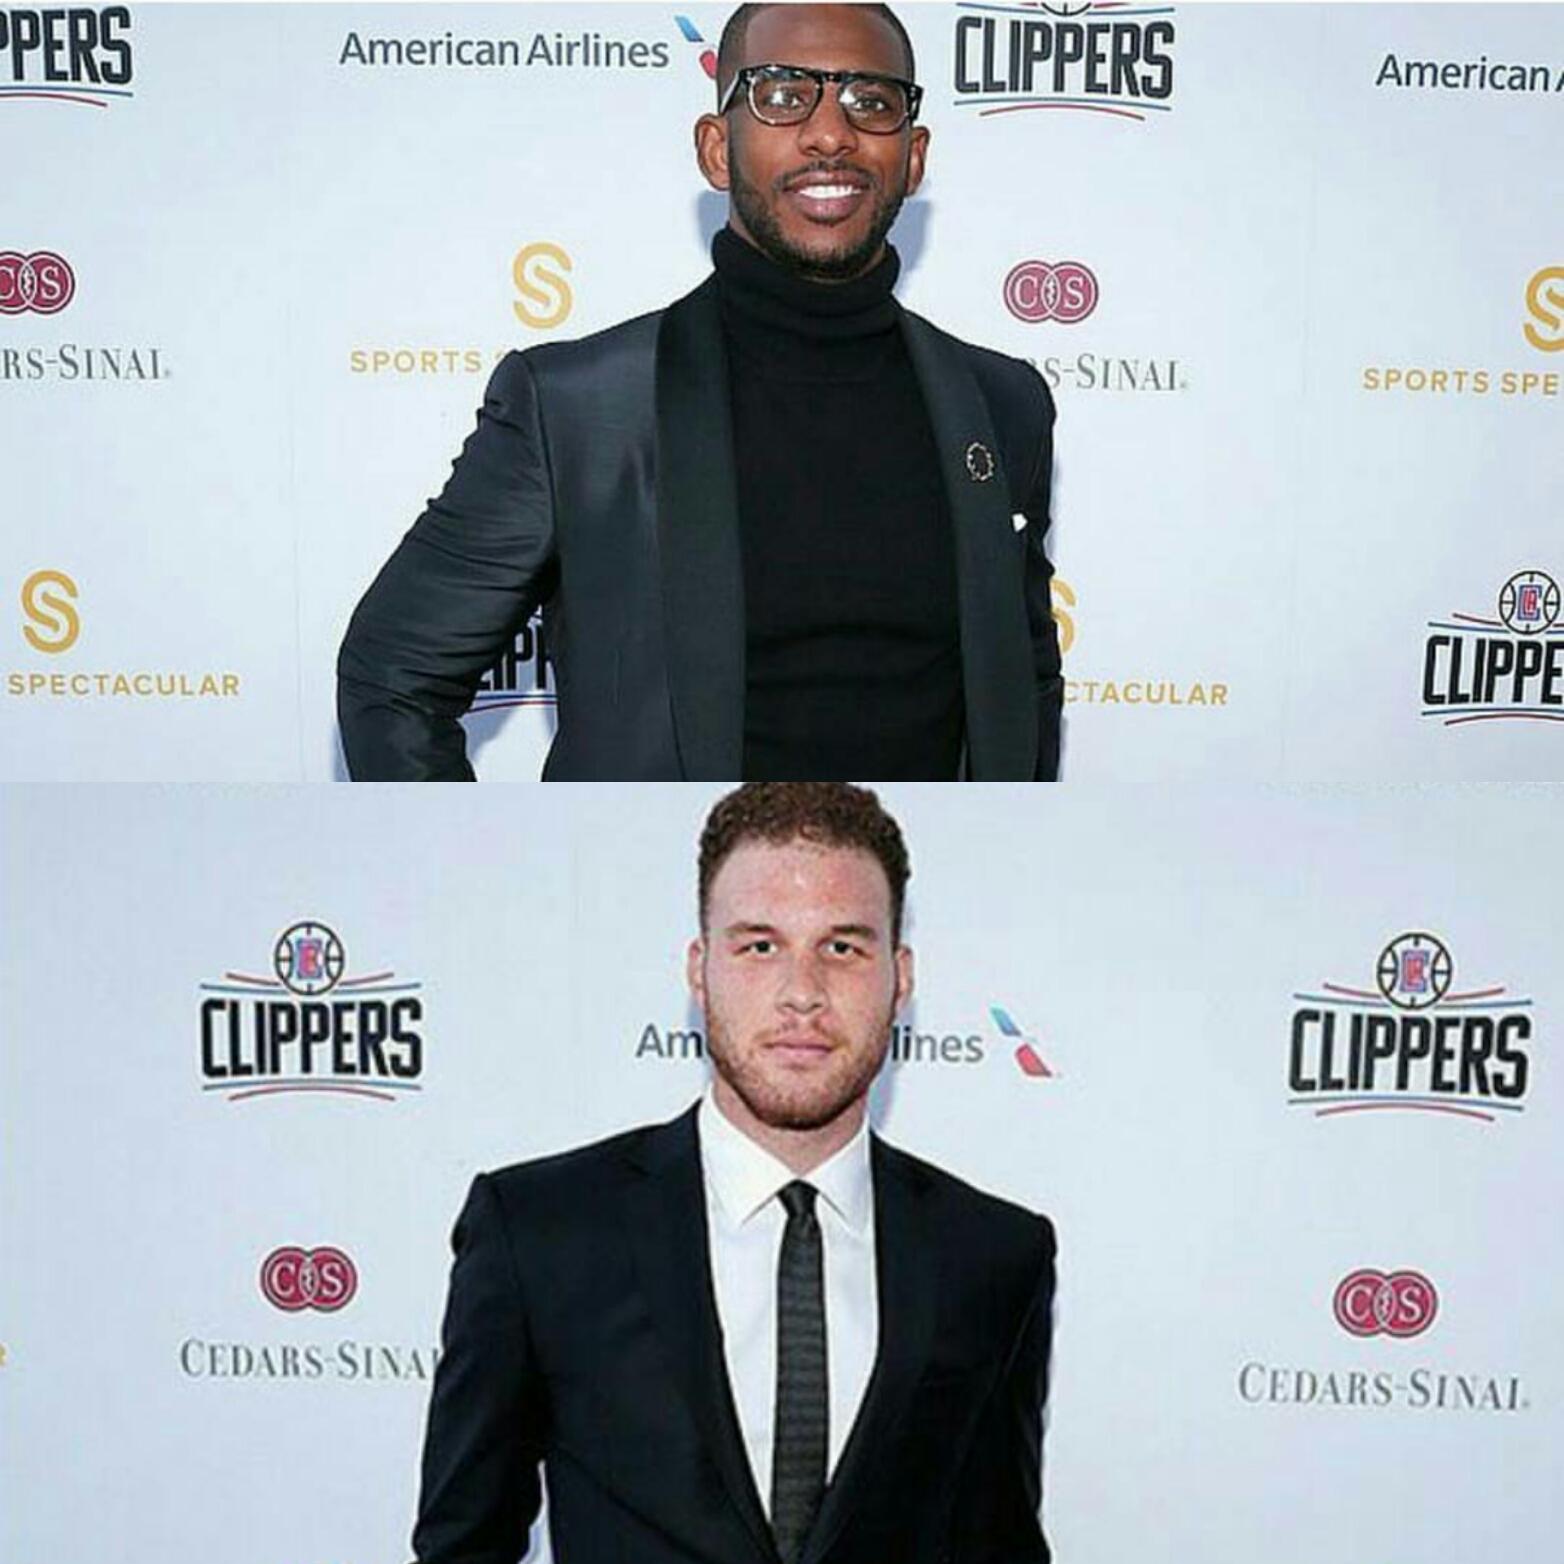 STYLE: Chris Paul, Blake Griffin Wear Ermenegildo Zegna For 31st Annual Cedars-Sinai Sports Spectacular